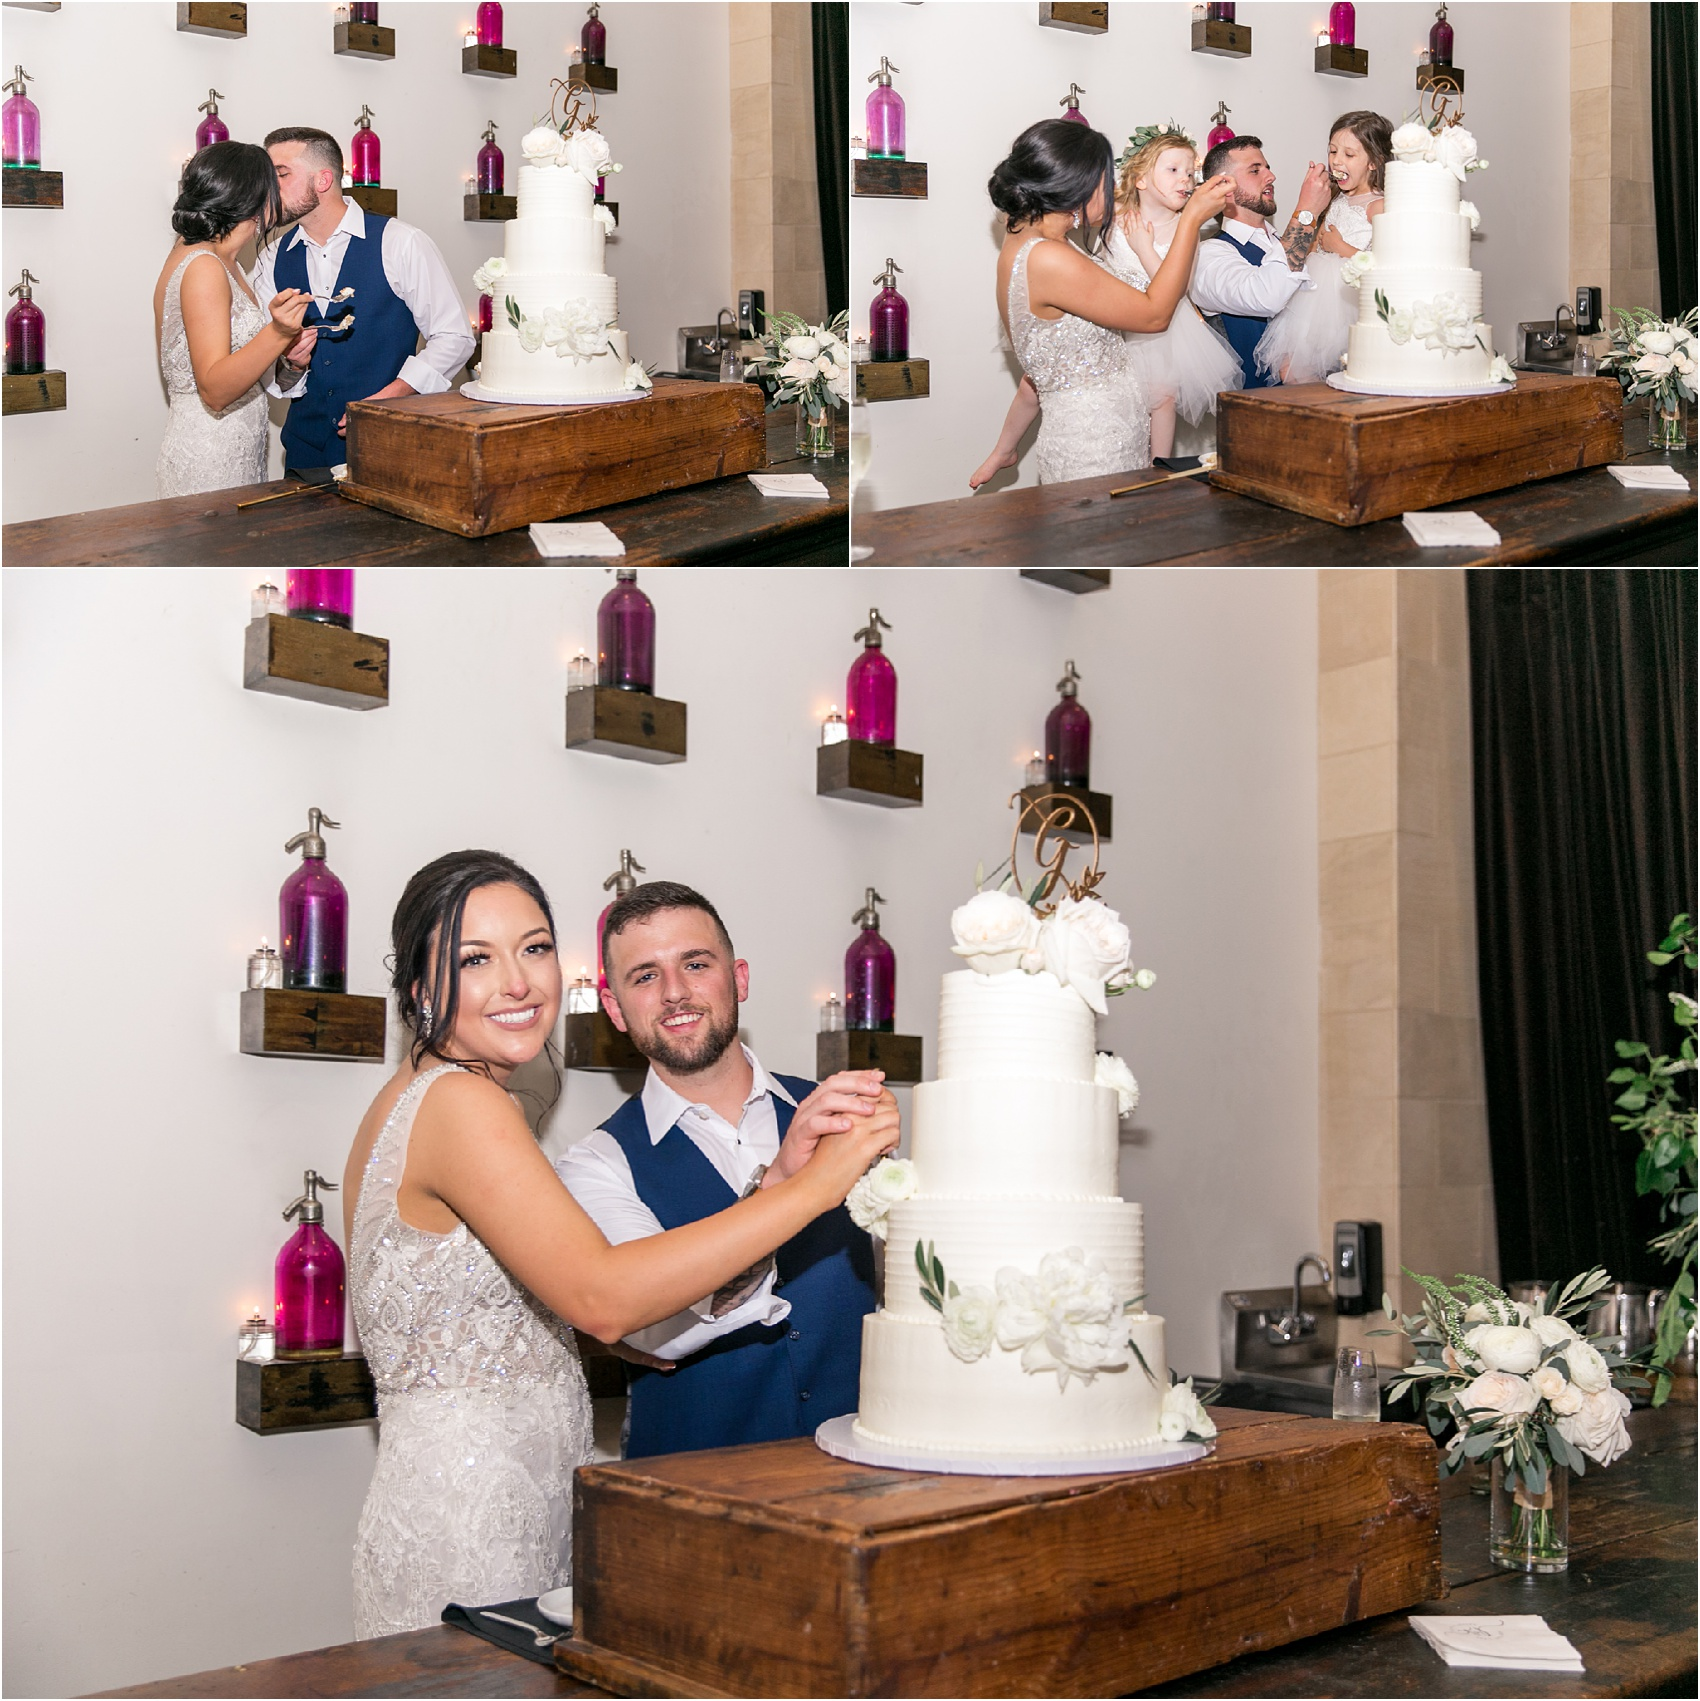 Savannah Eve Photography- Turnbill-Gilgan Wedding- Blog-91.jpg